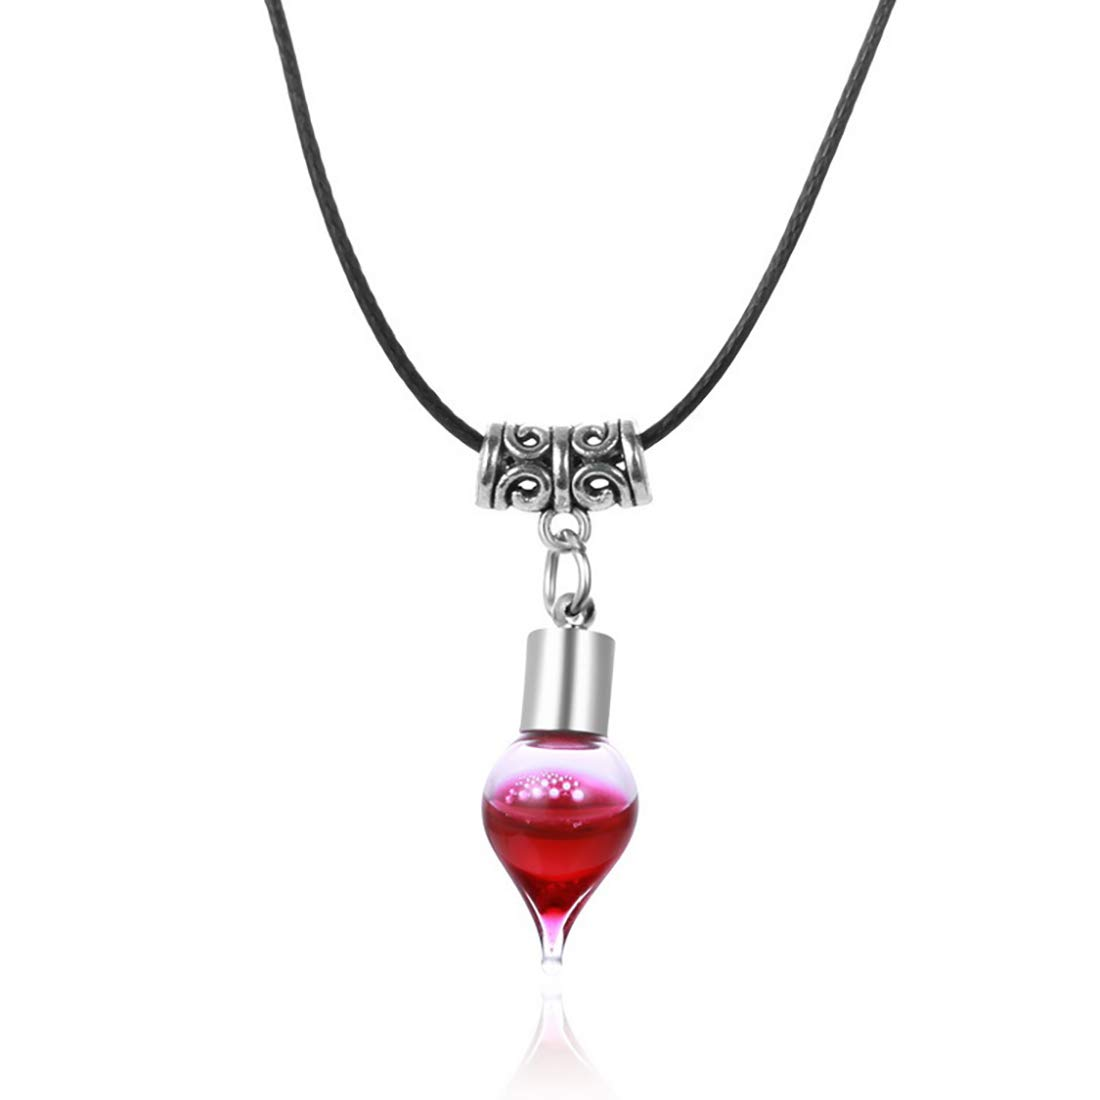 ZM168 Choker Blood Drop Jewellery Fashion Vampire